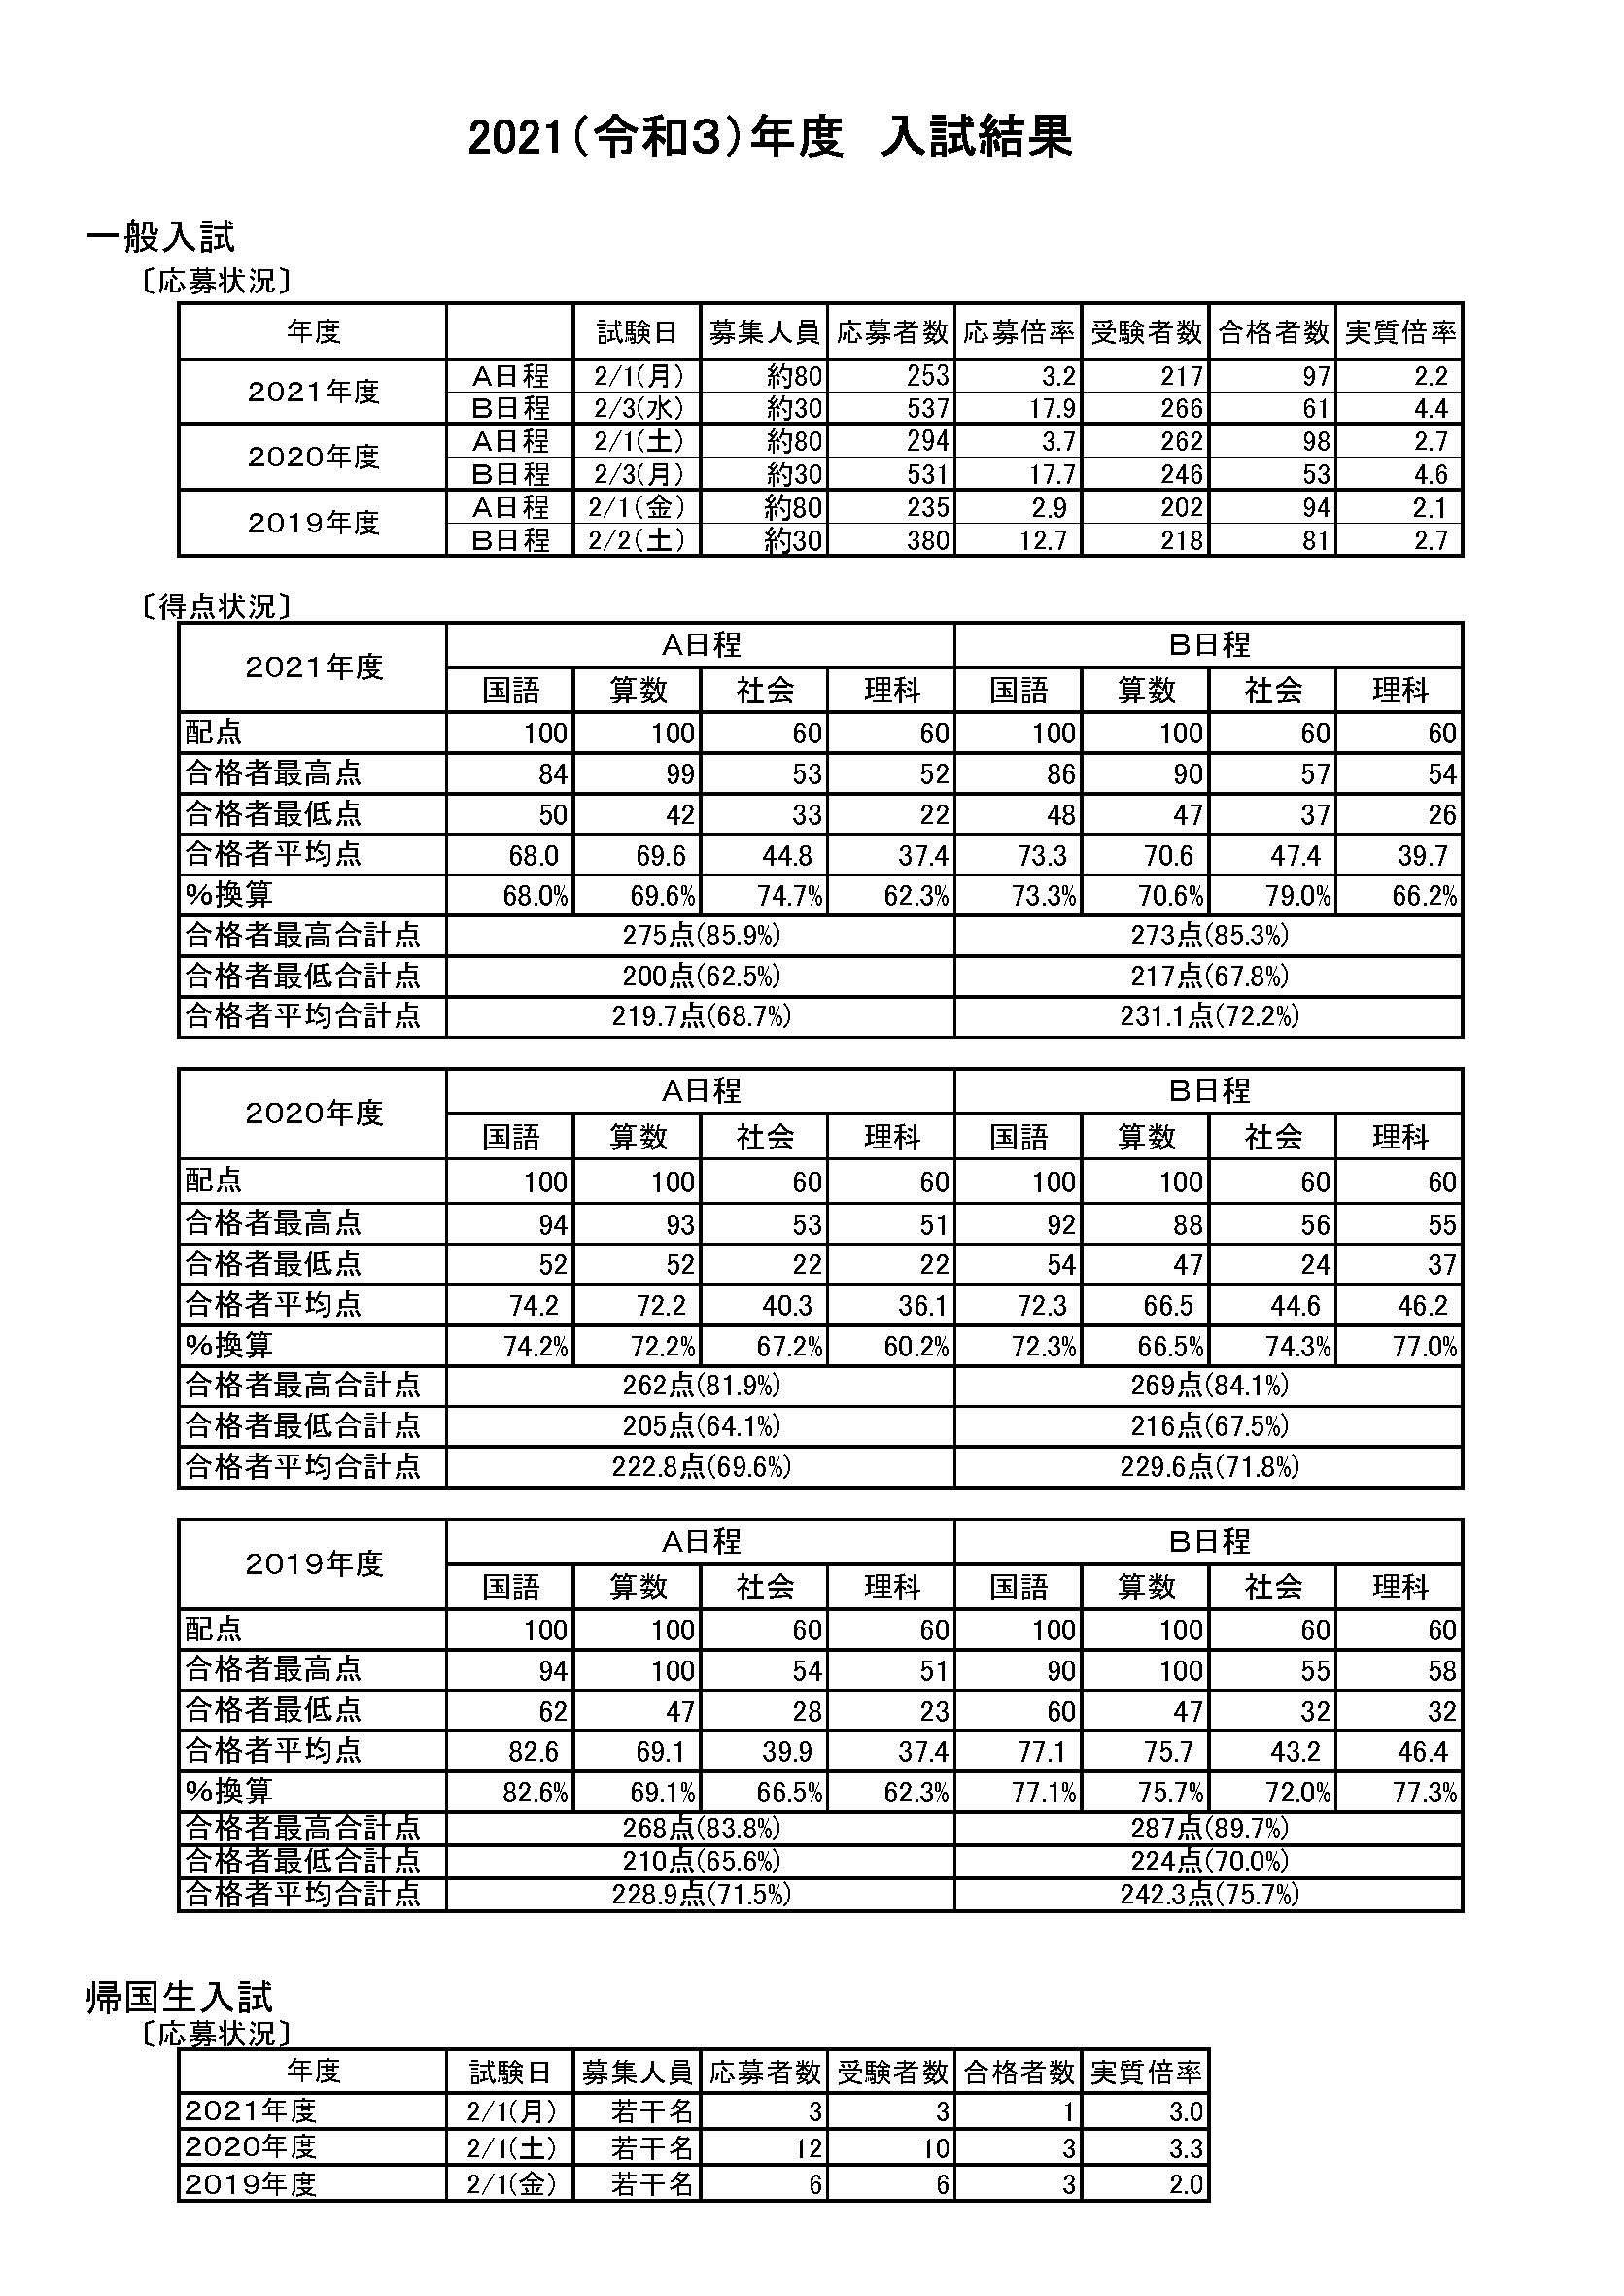 2021nyushi-jyokyo-kekka.jpg